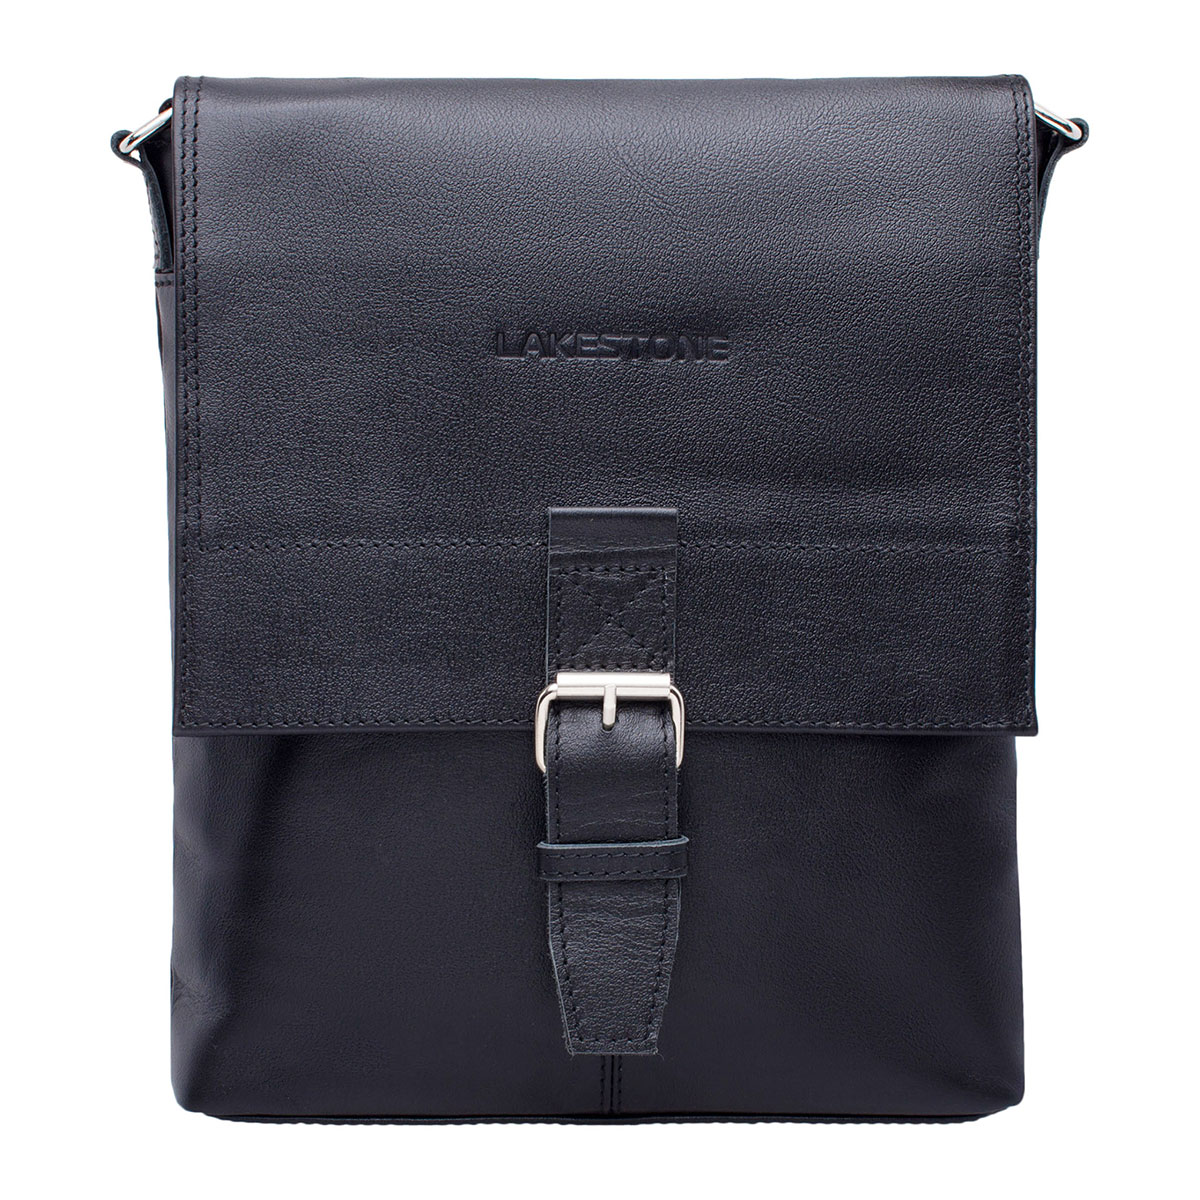 Мужская сумка через плечо Charles Black